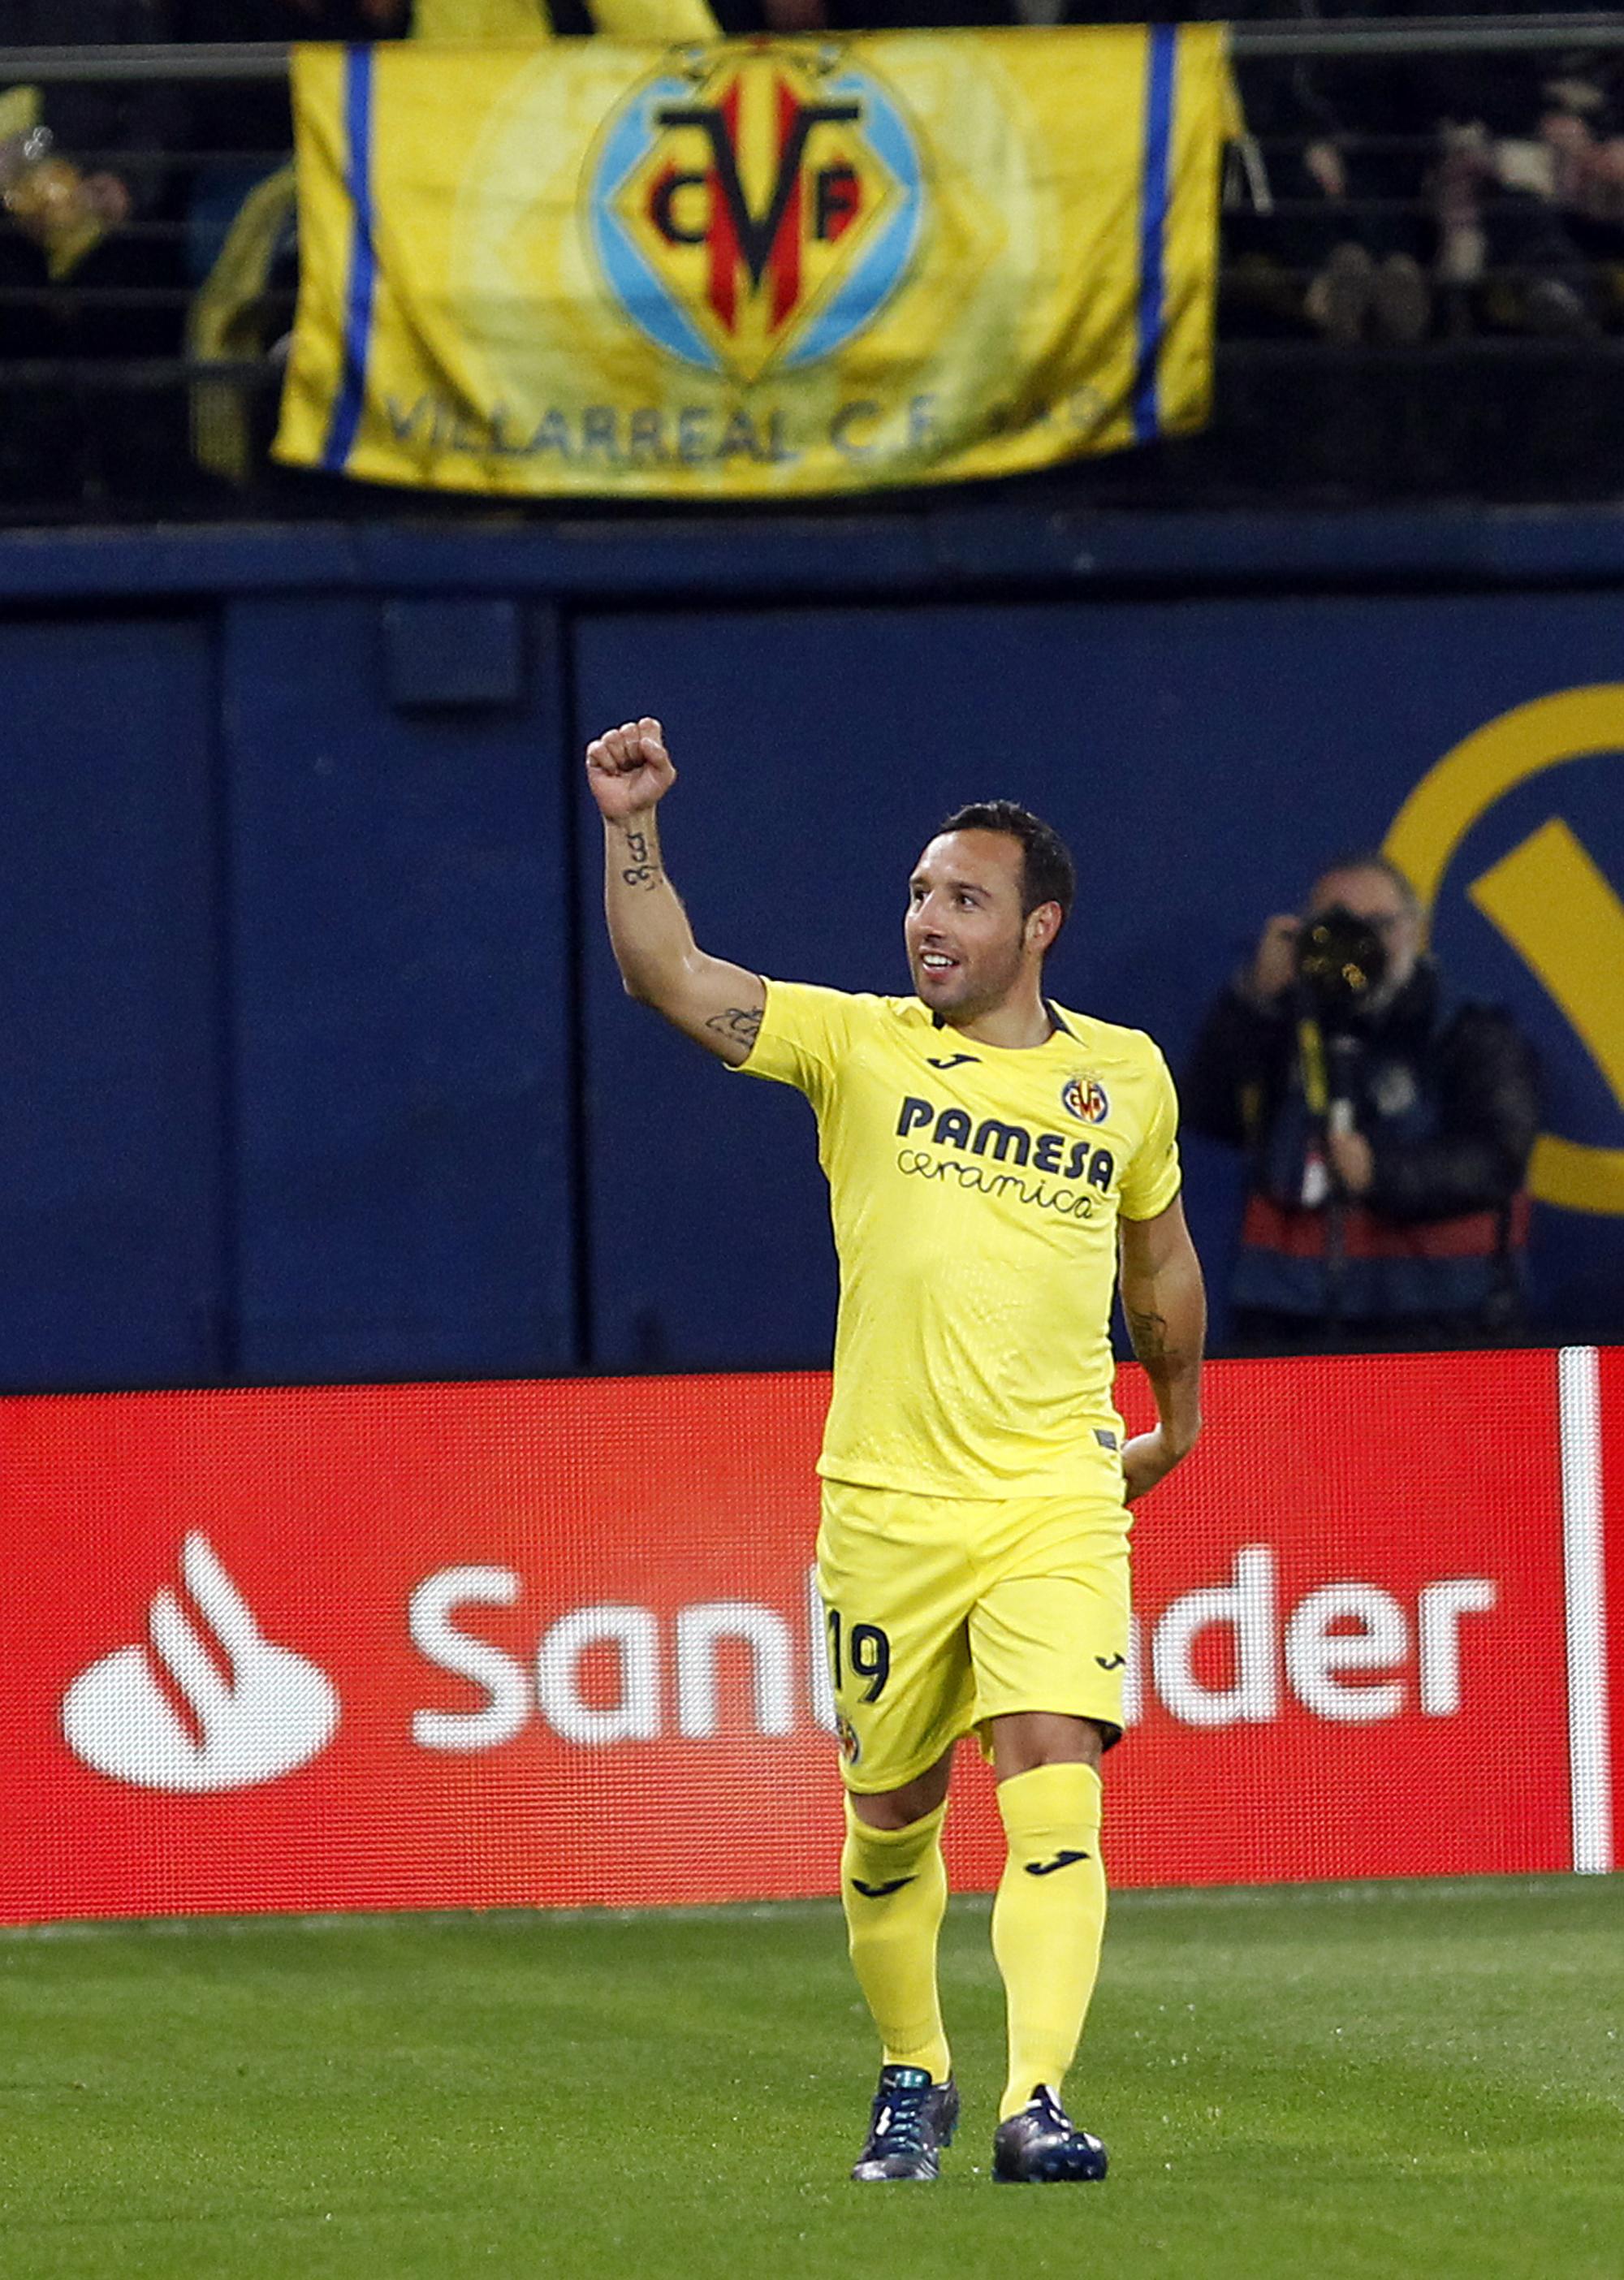 Cazorla scores 2 as Villarreal draws 2-2 with Real Madrid